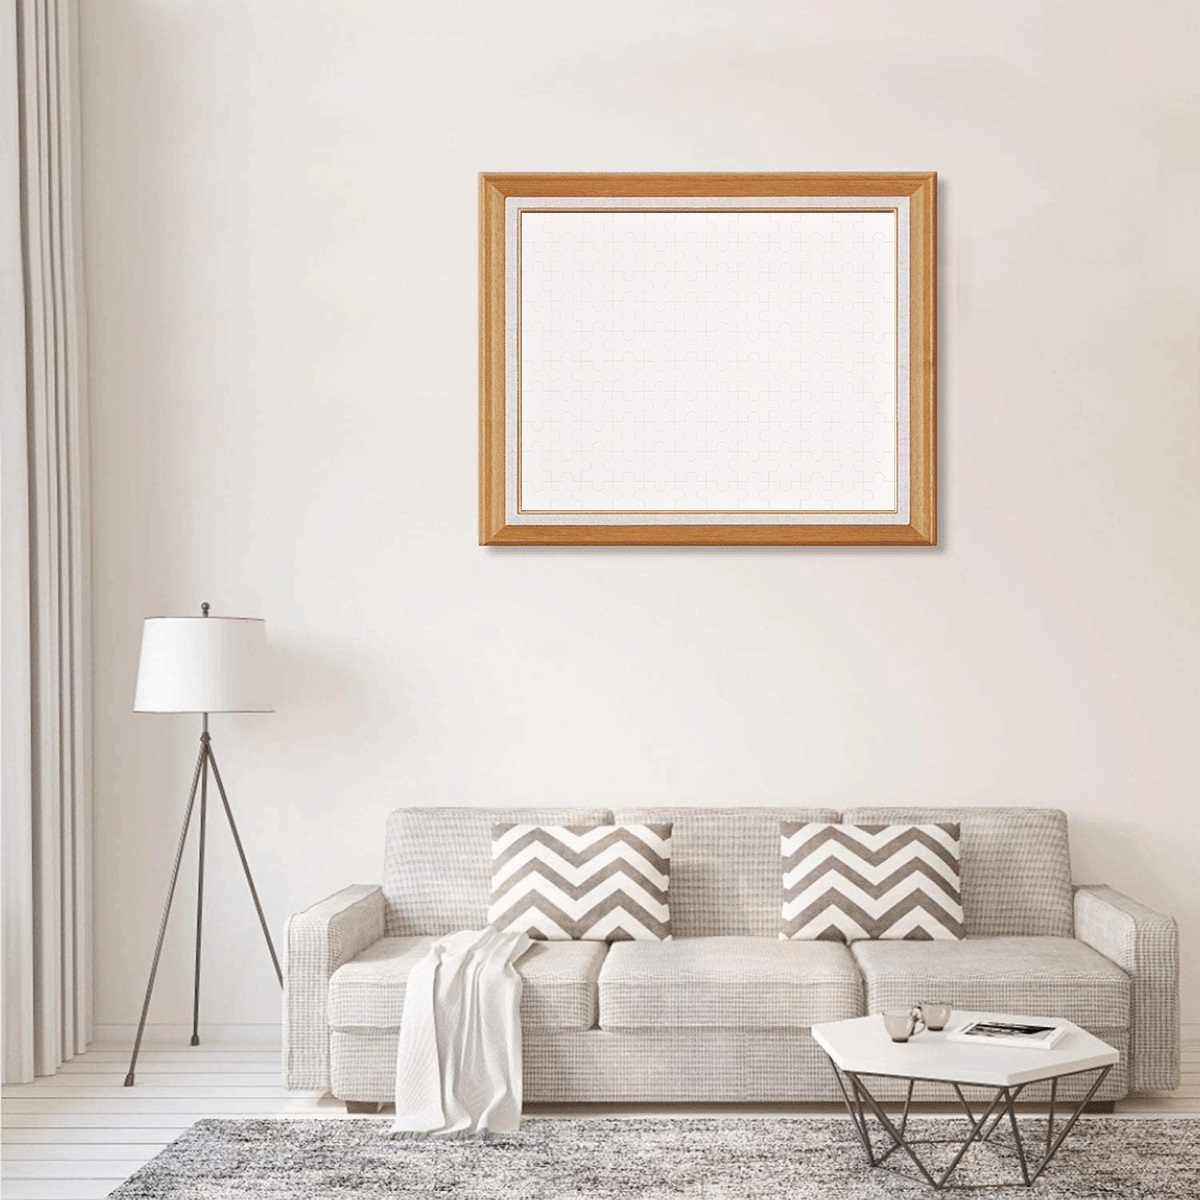 120-Piece Wooden Photo Puzzles